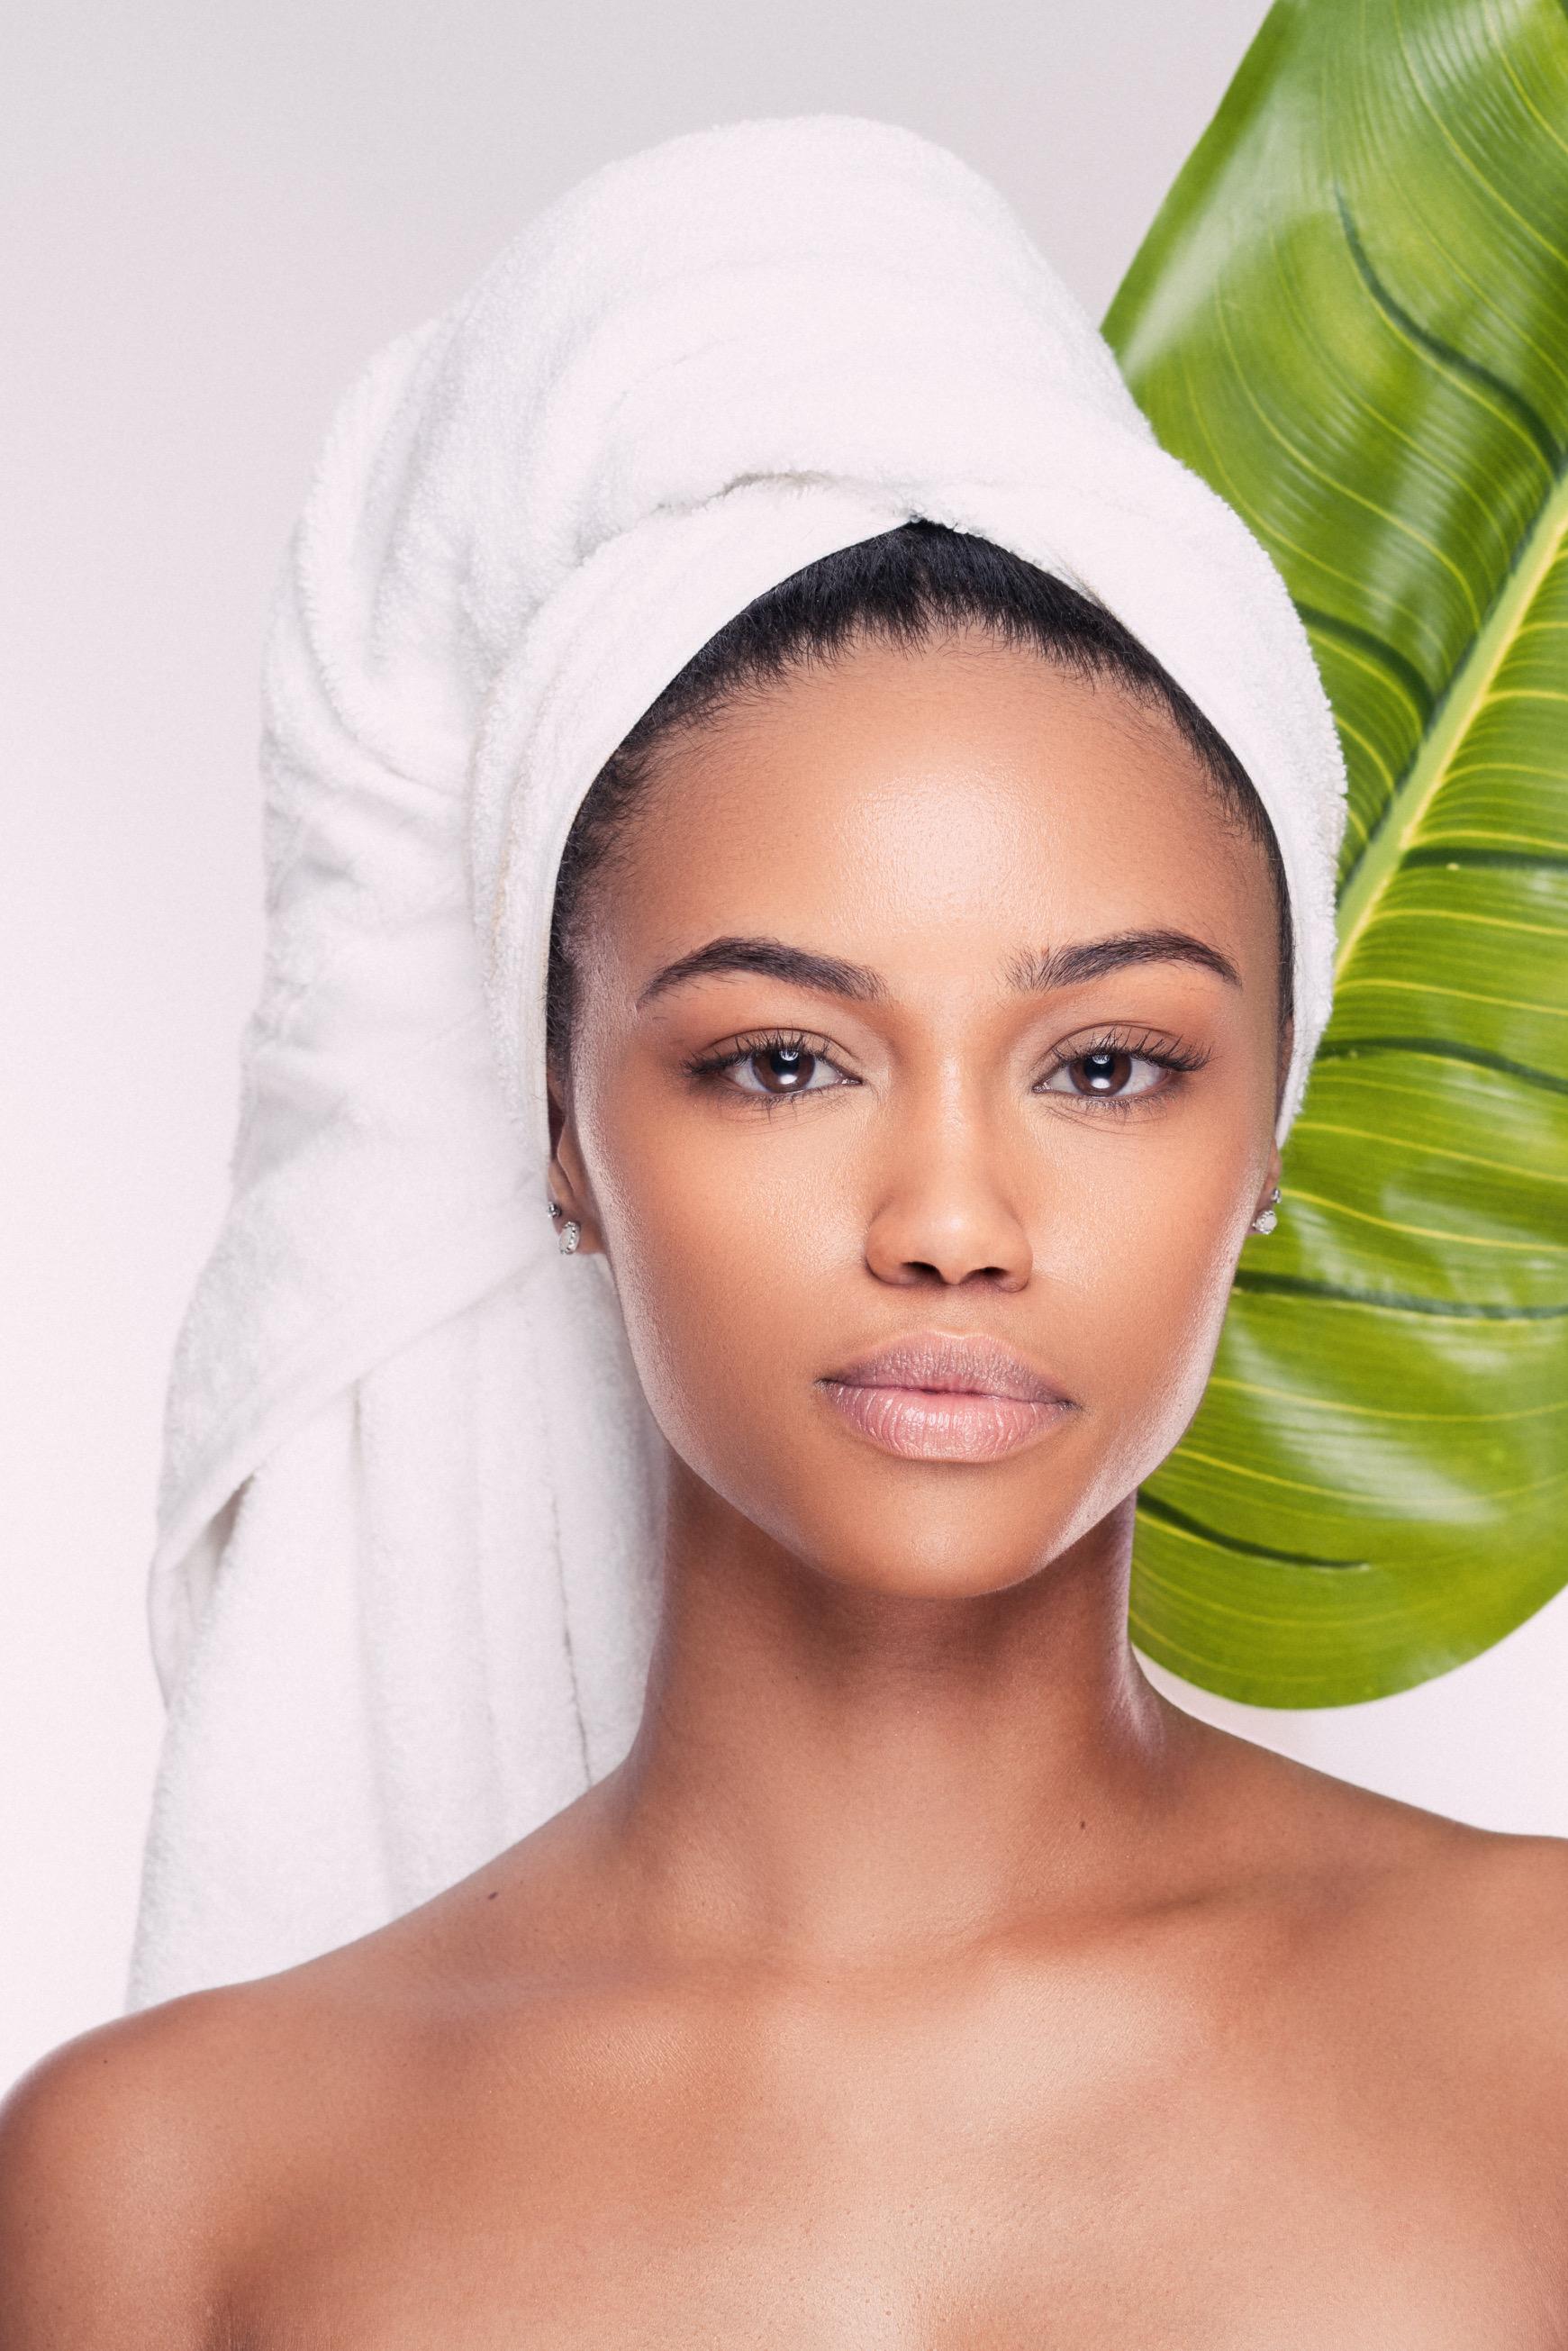 Clean Skin Headshot 02103-Edit.JPG